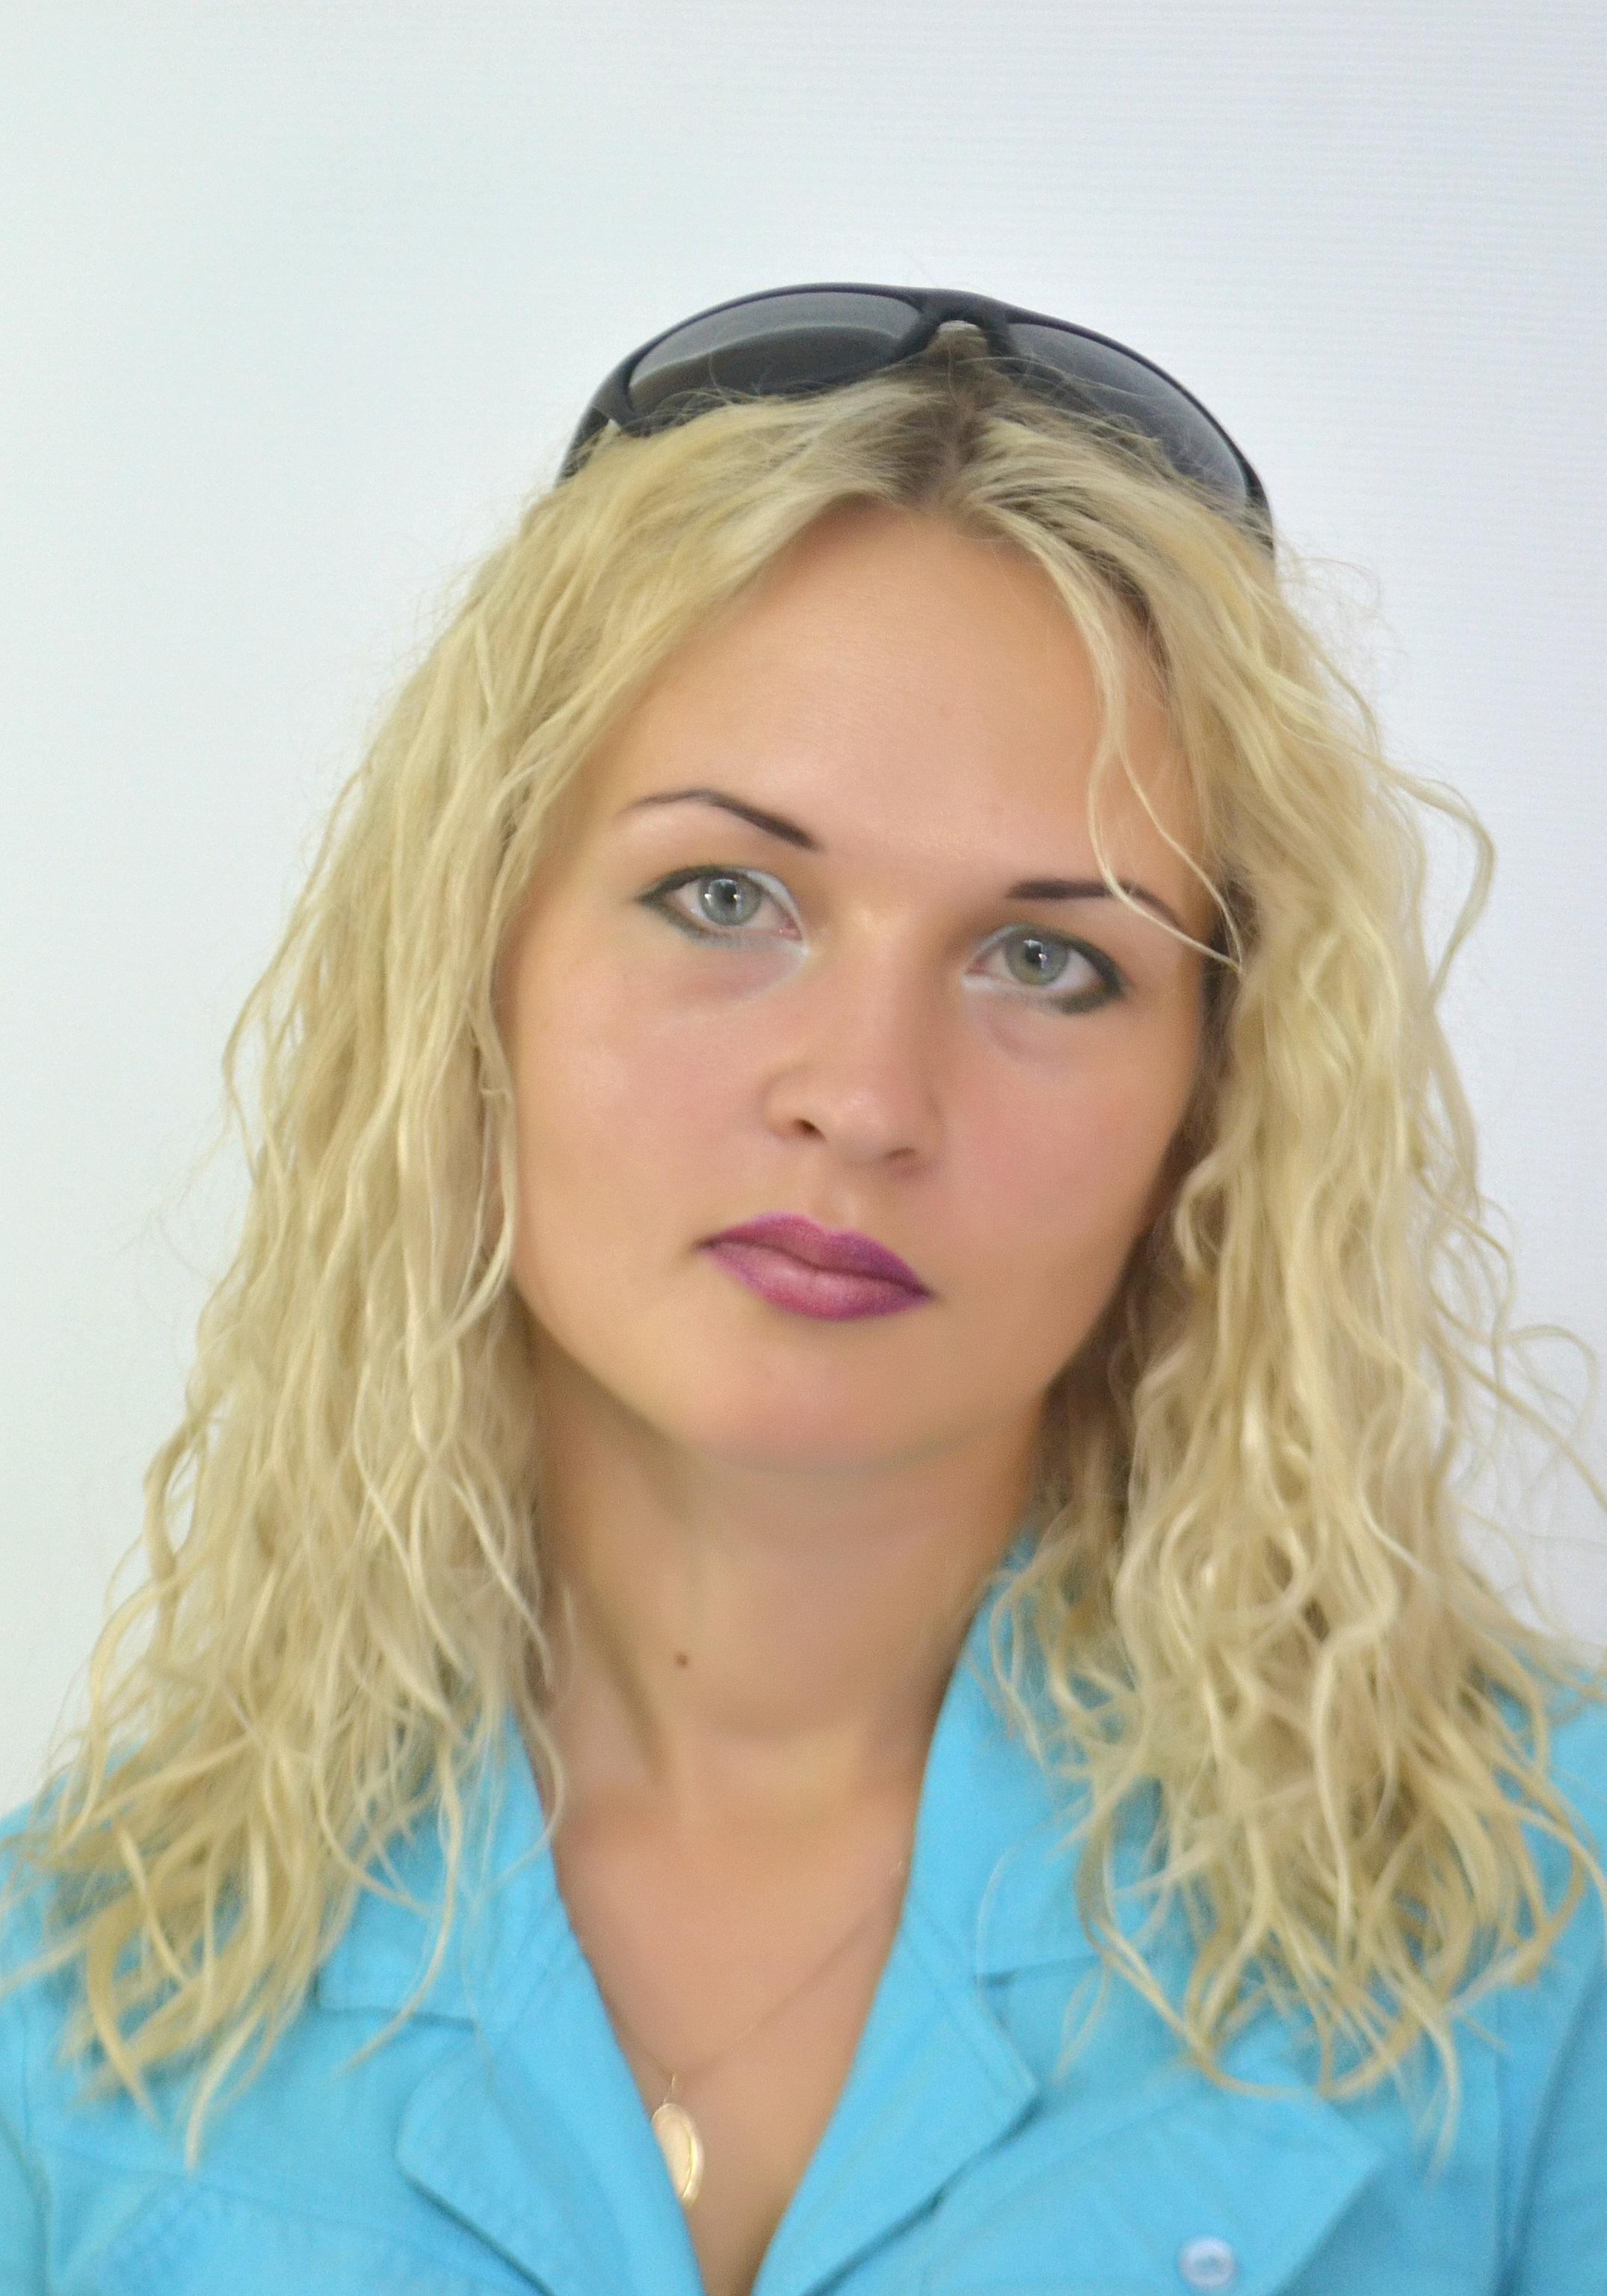 Kostenlose Foto Person Madchen Modell Blond Frisur